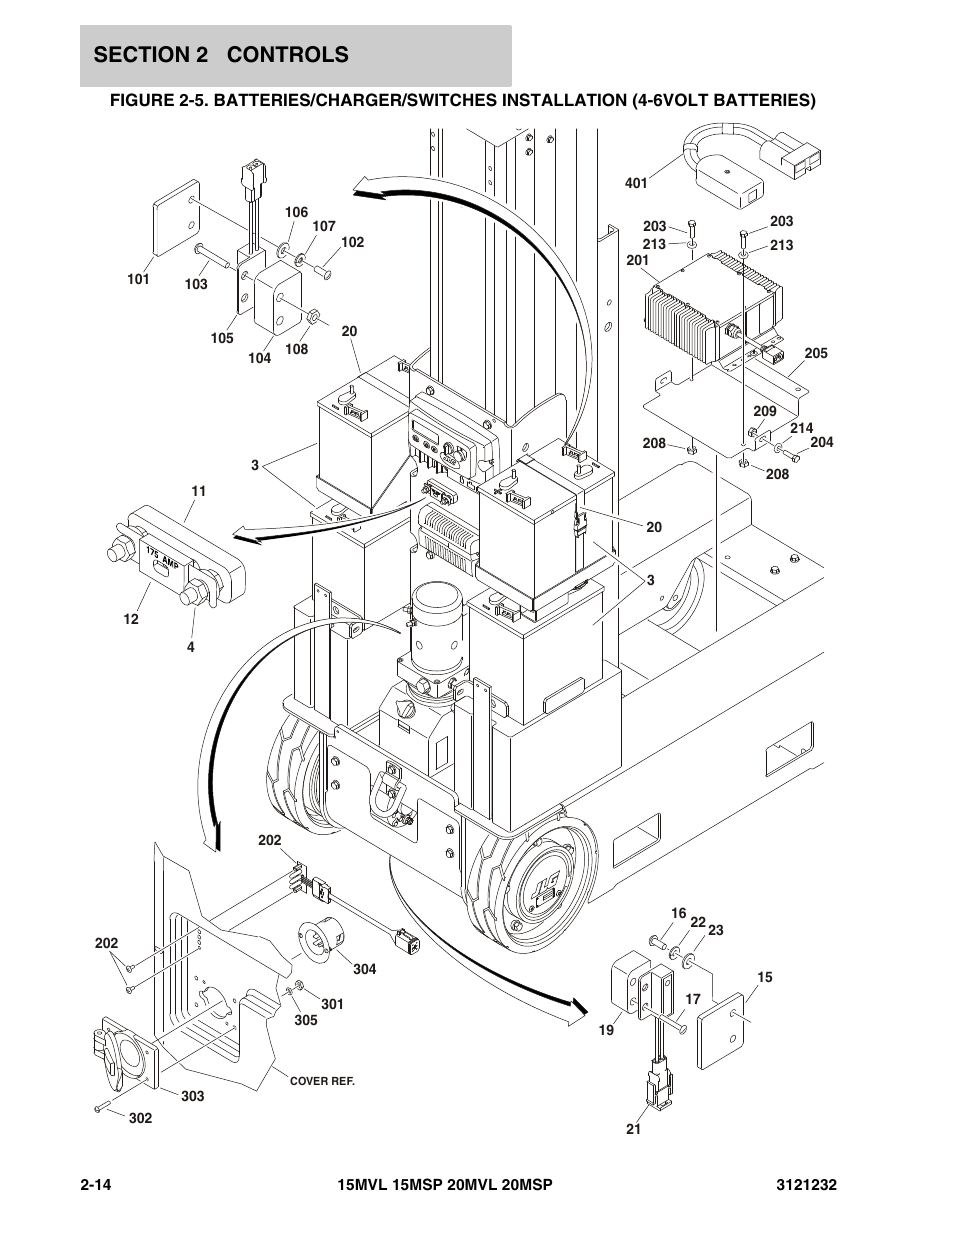 Manual 202